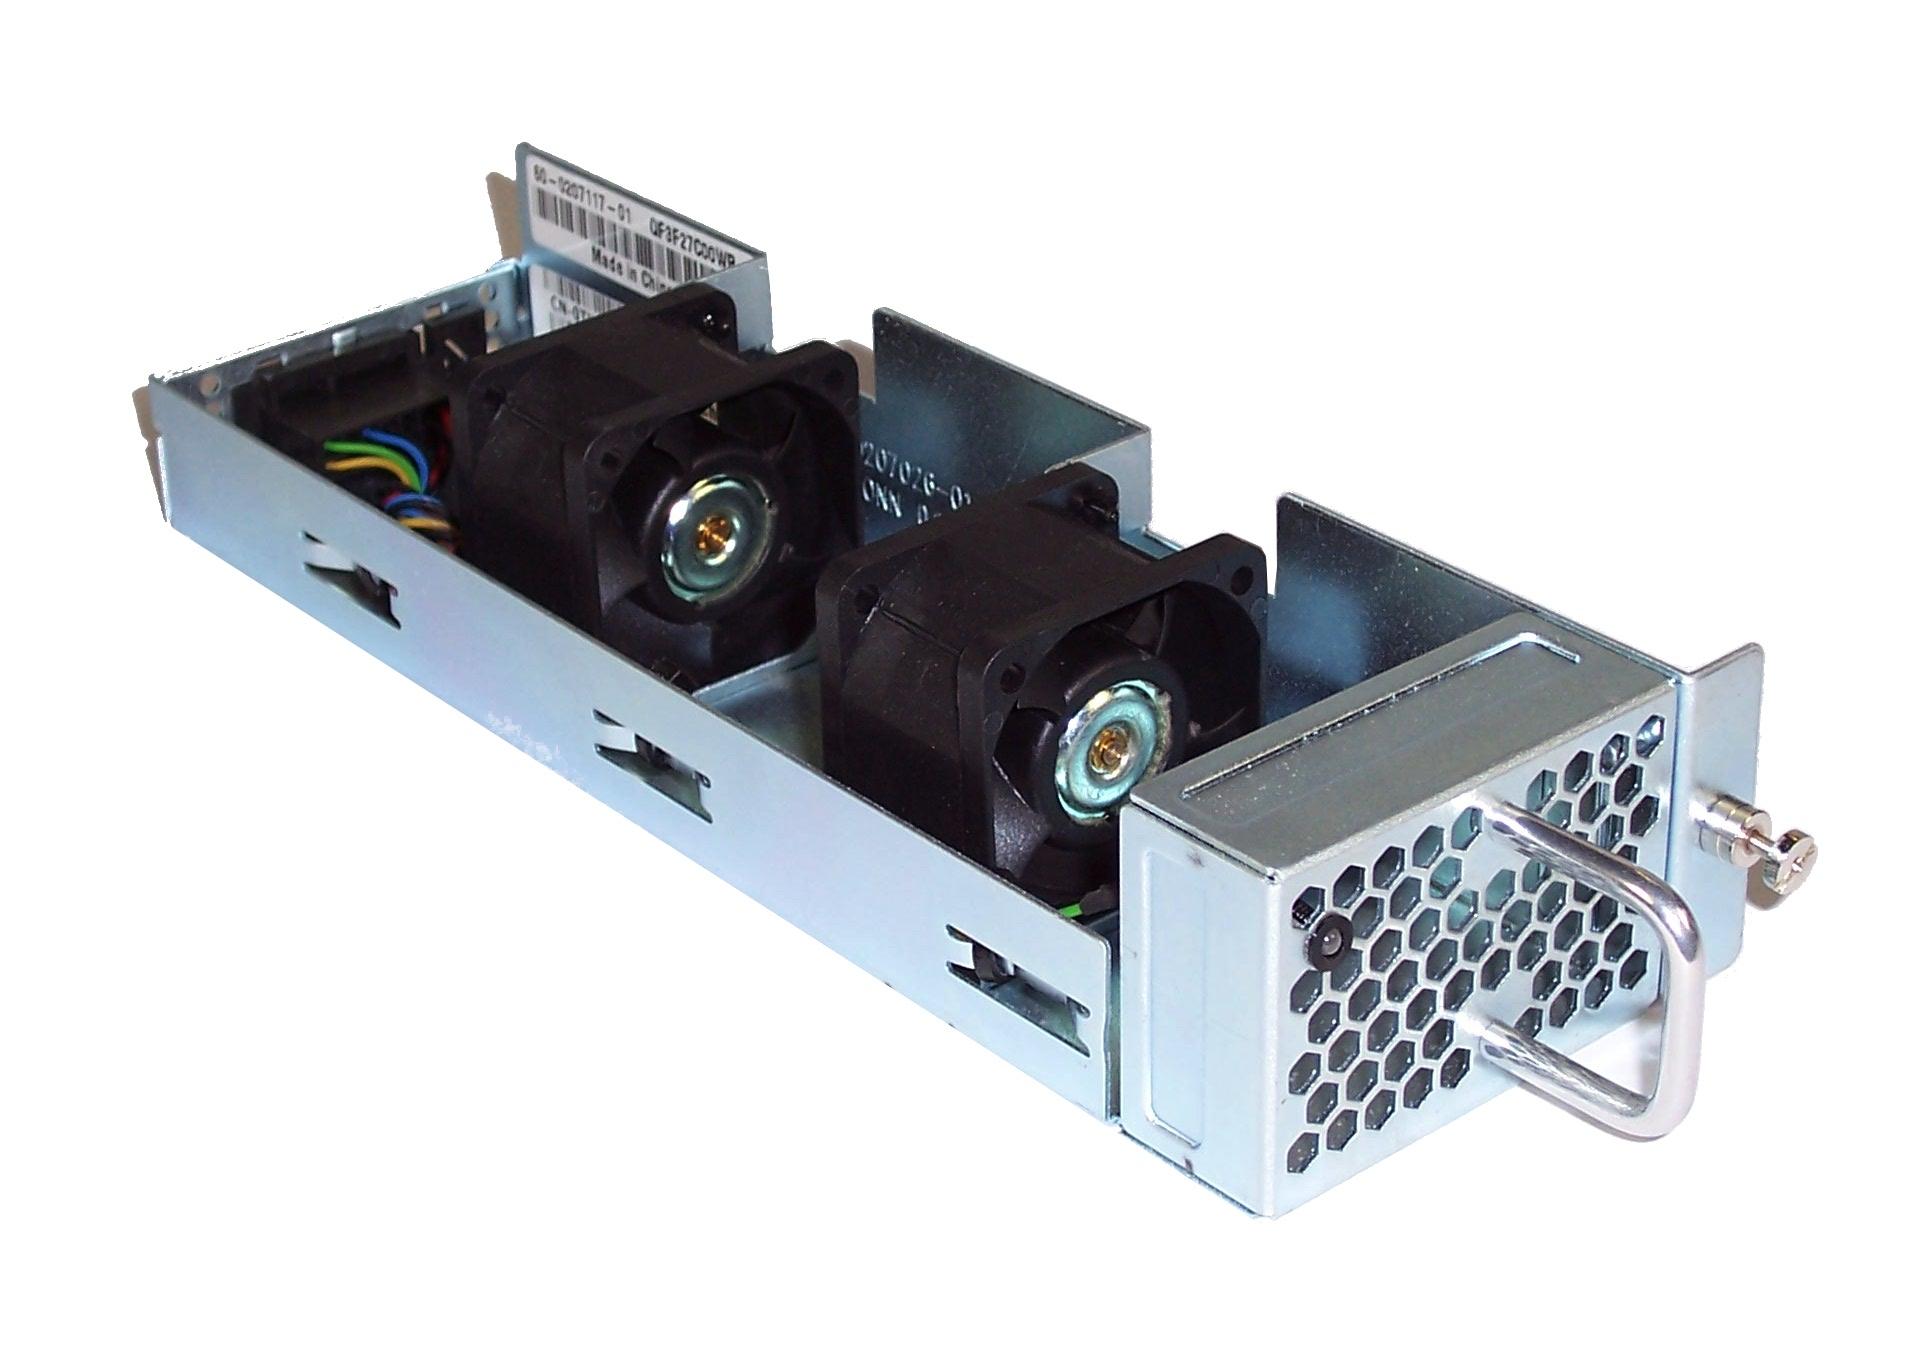 Dell TH128 Brocade SilkWorm 4100 60-0207117-01 FC Switch Fan Tray Module